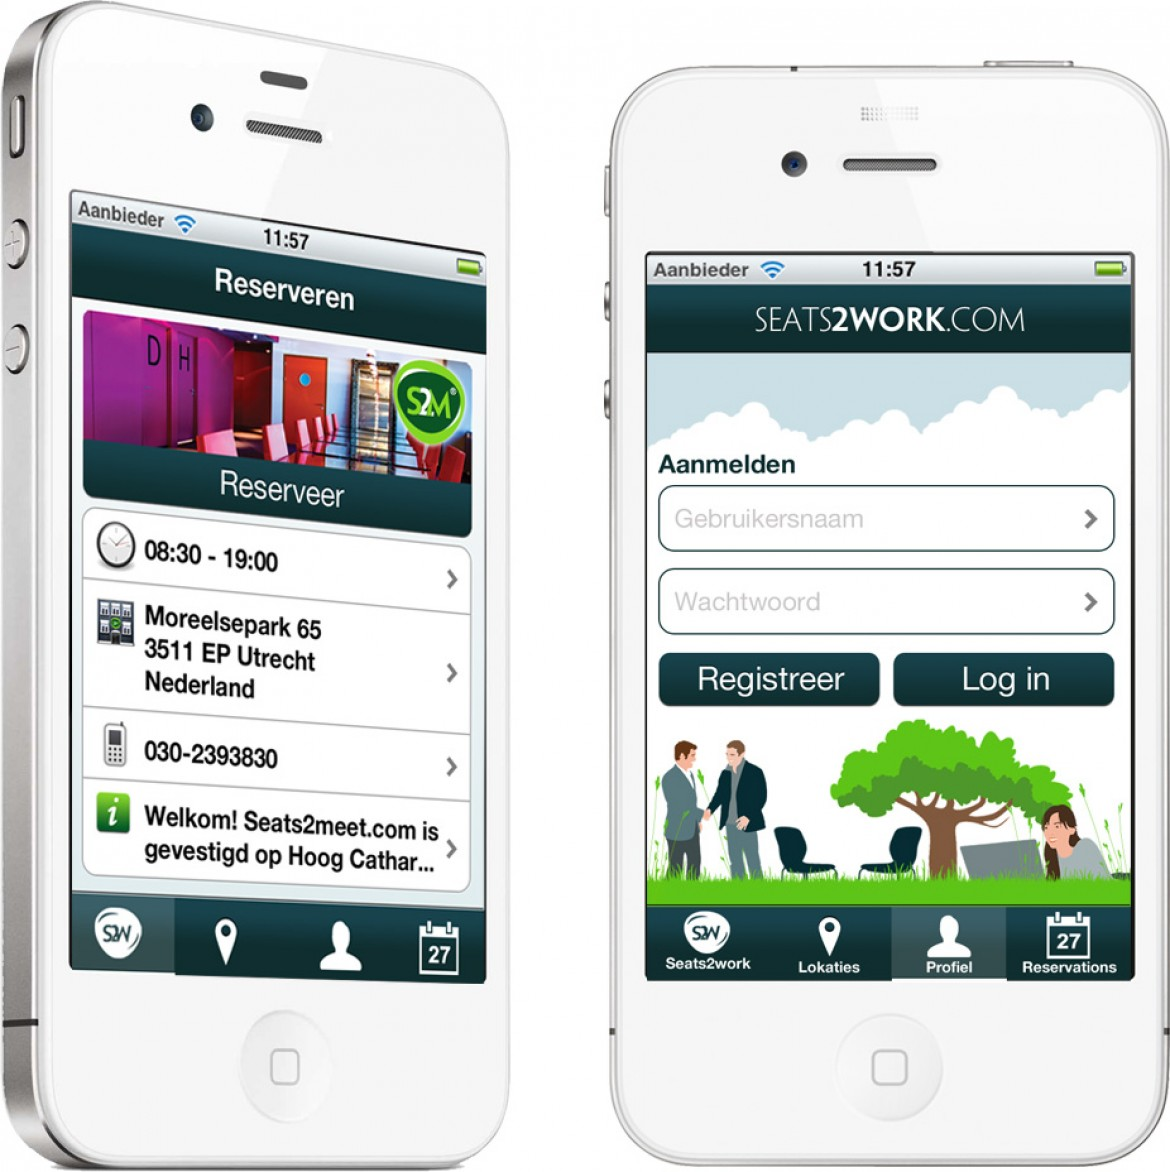 Seats2meet.com iPhone app